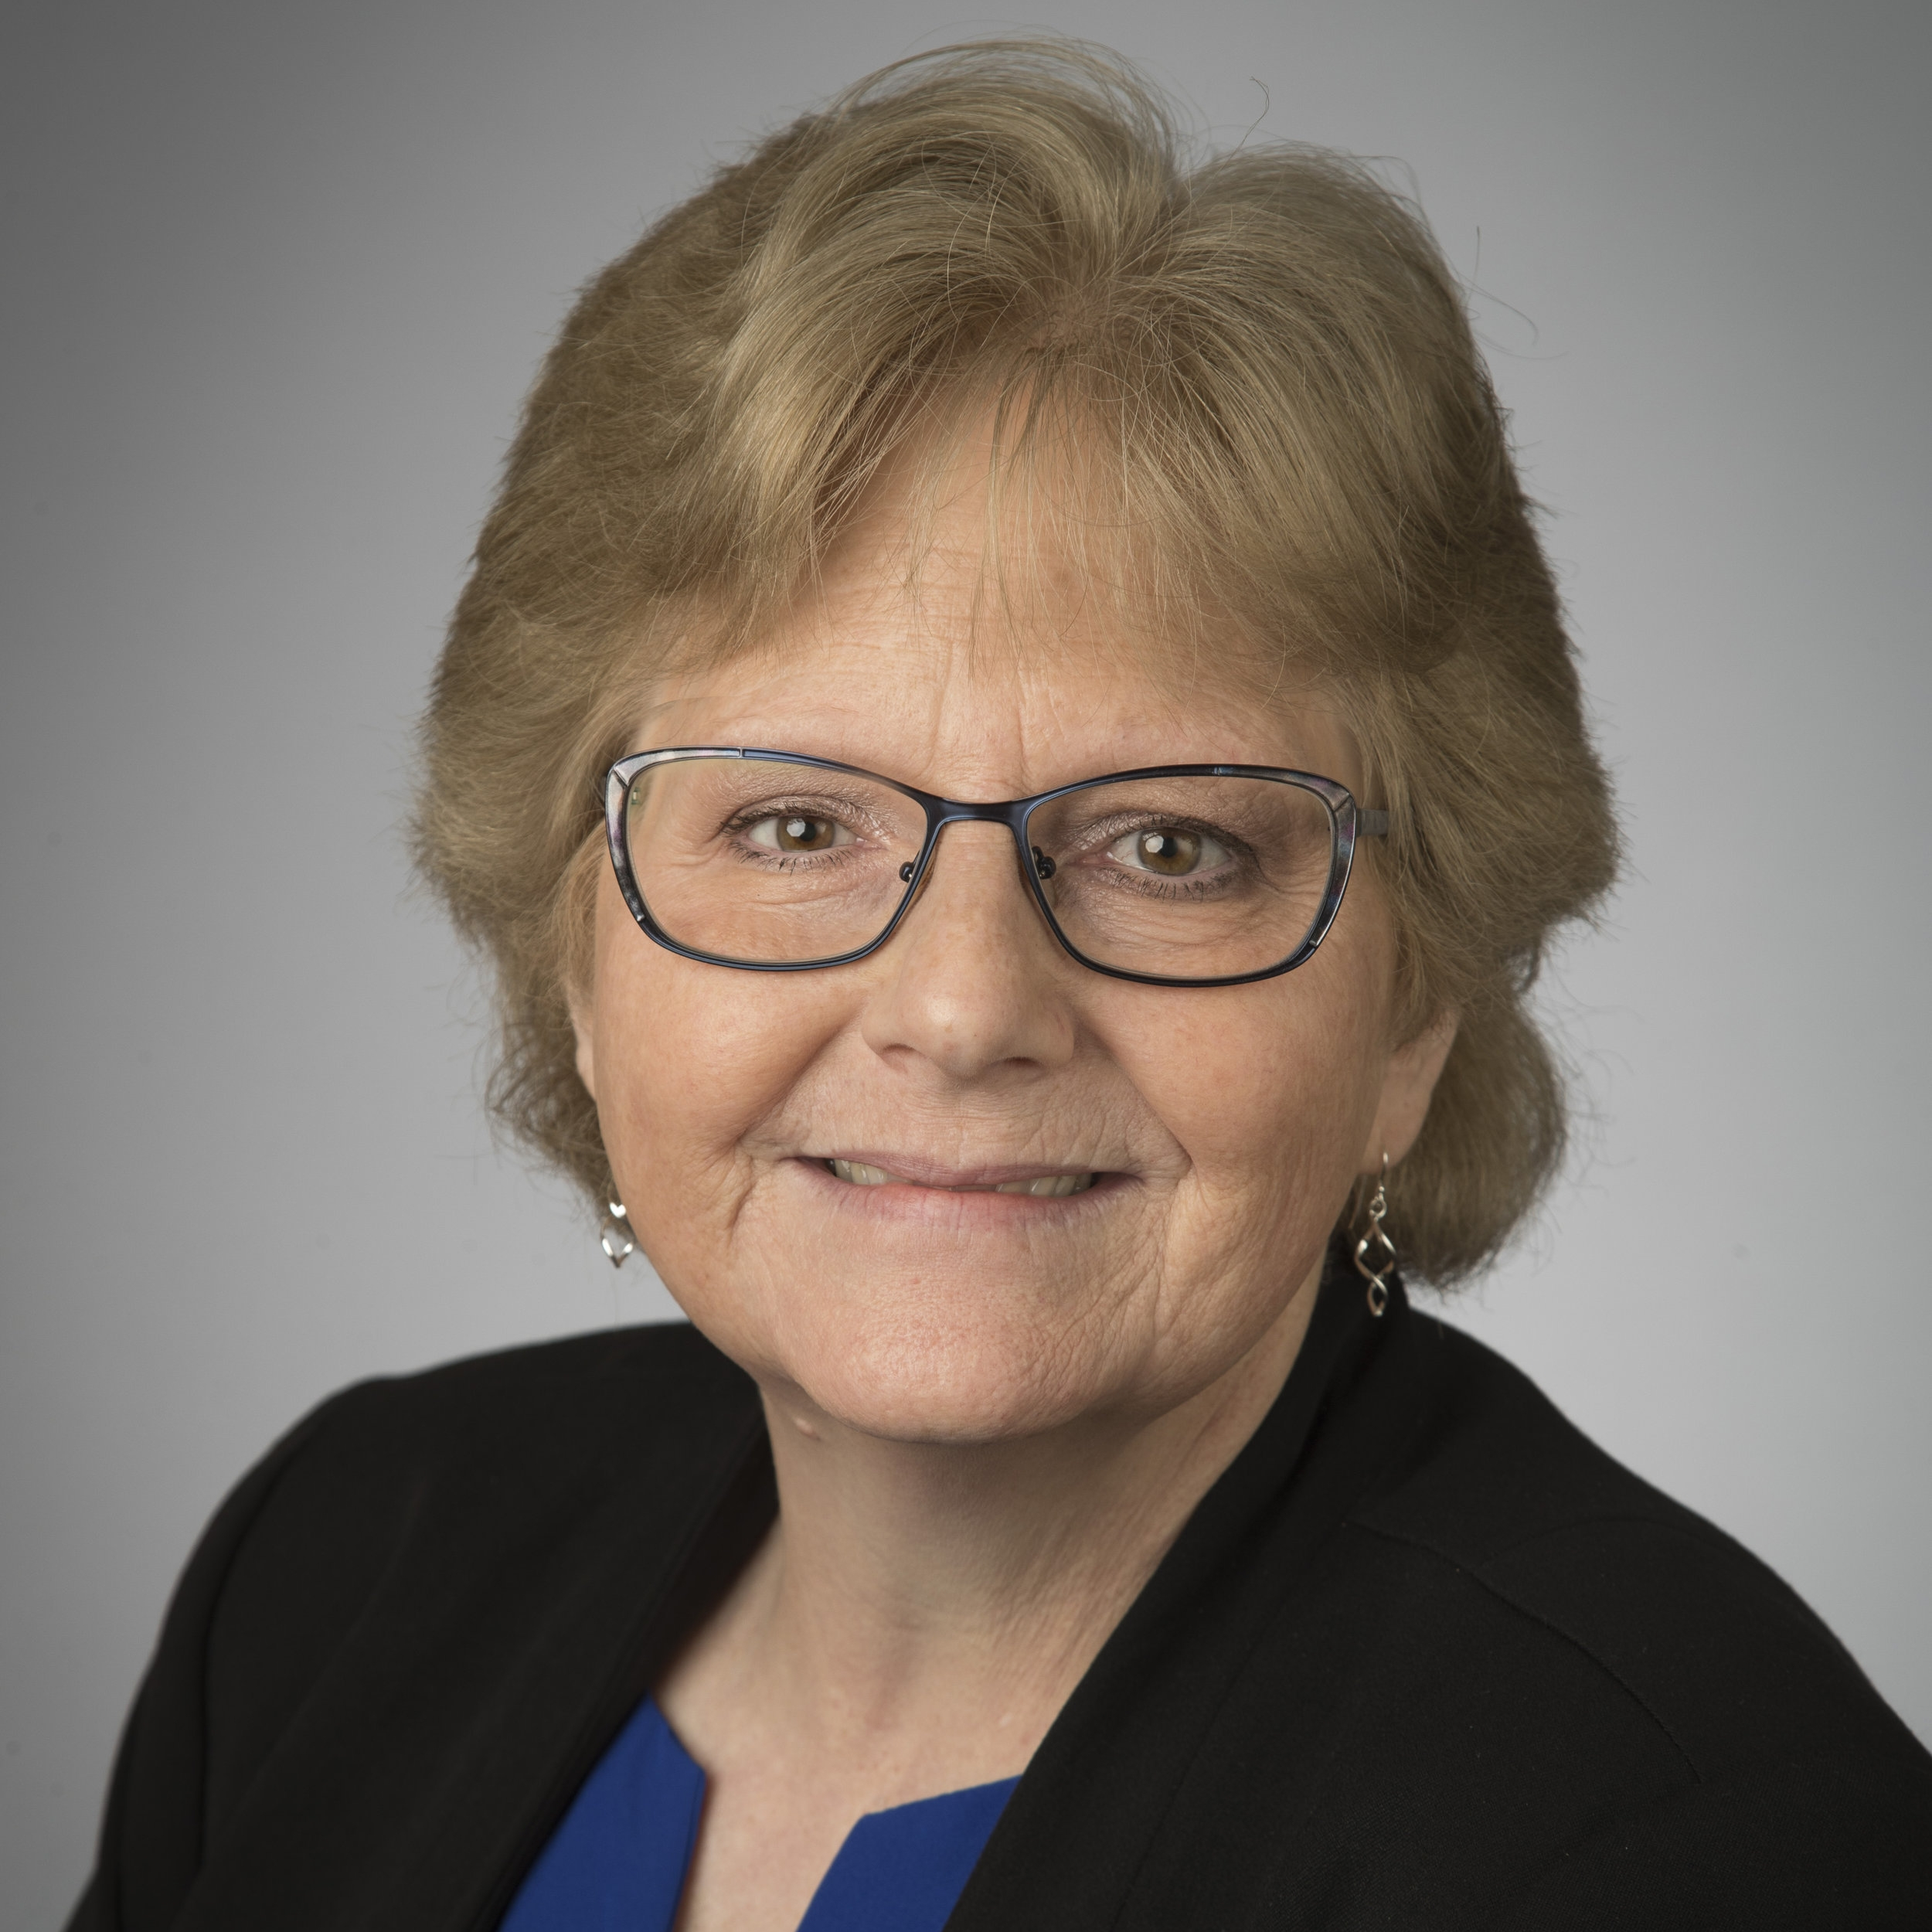 Dr. Diane M. Dittmar